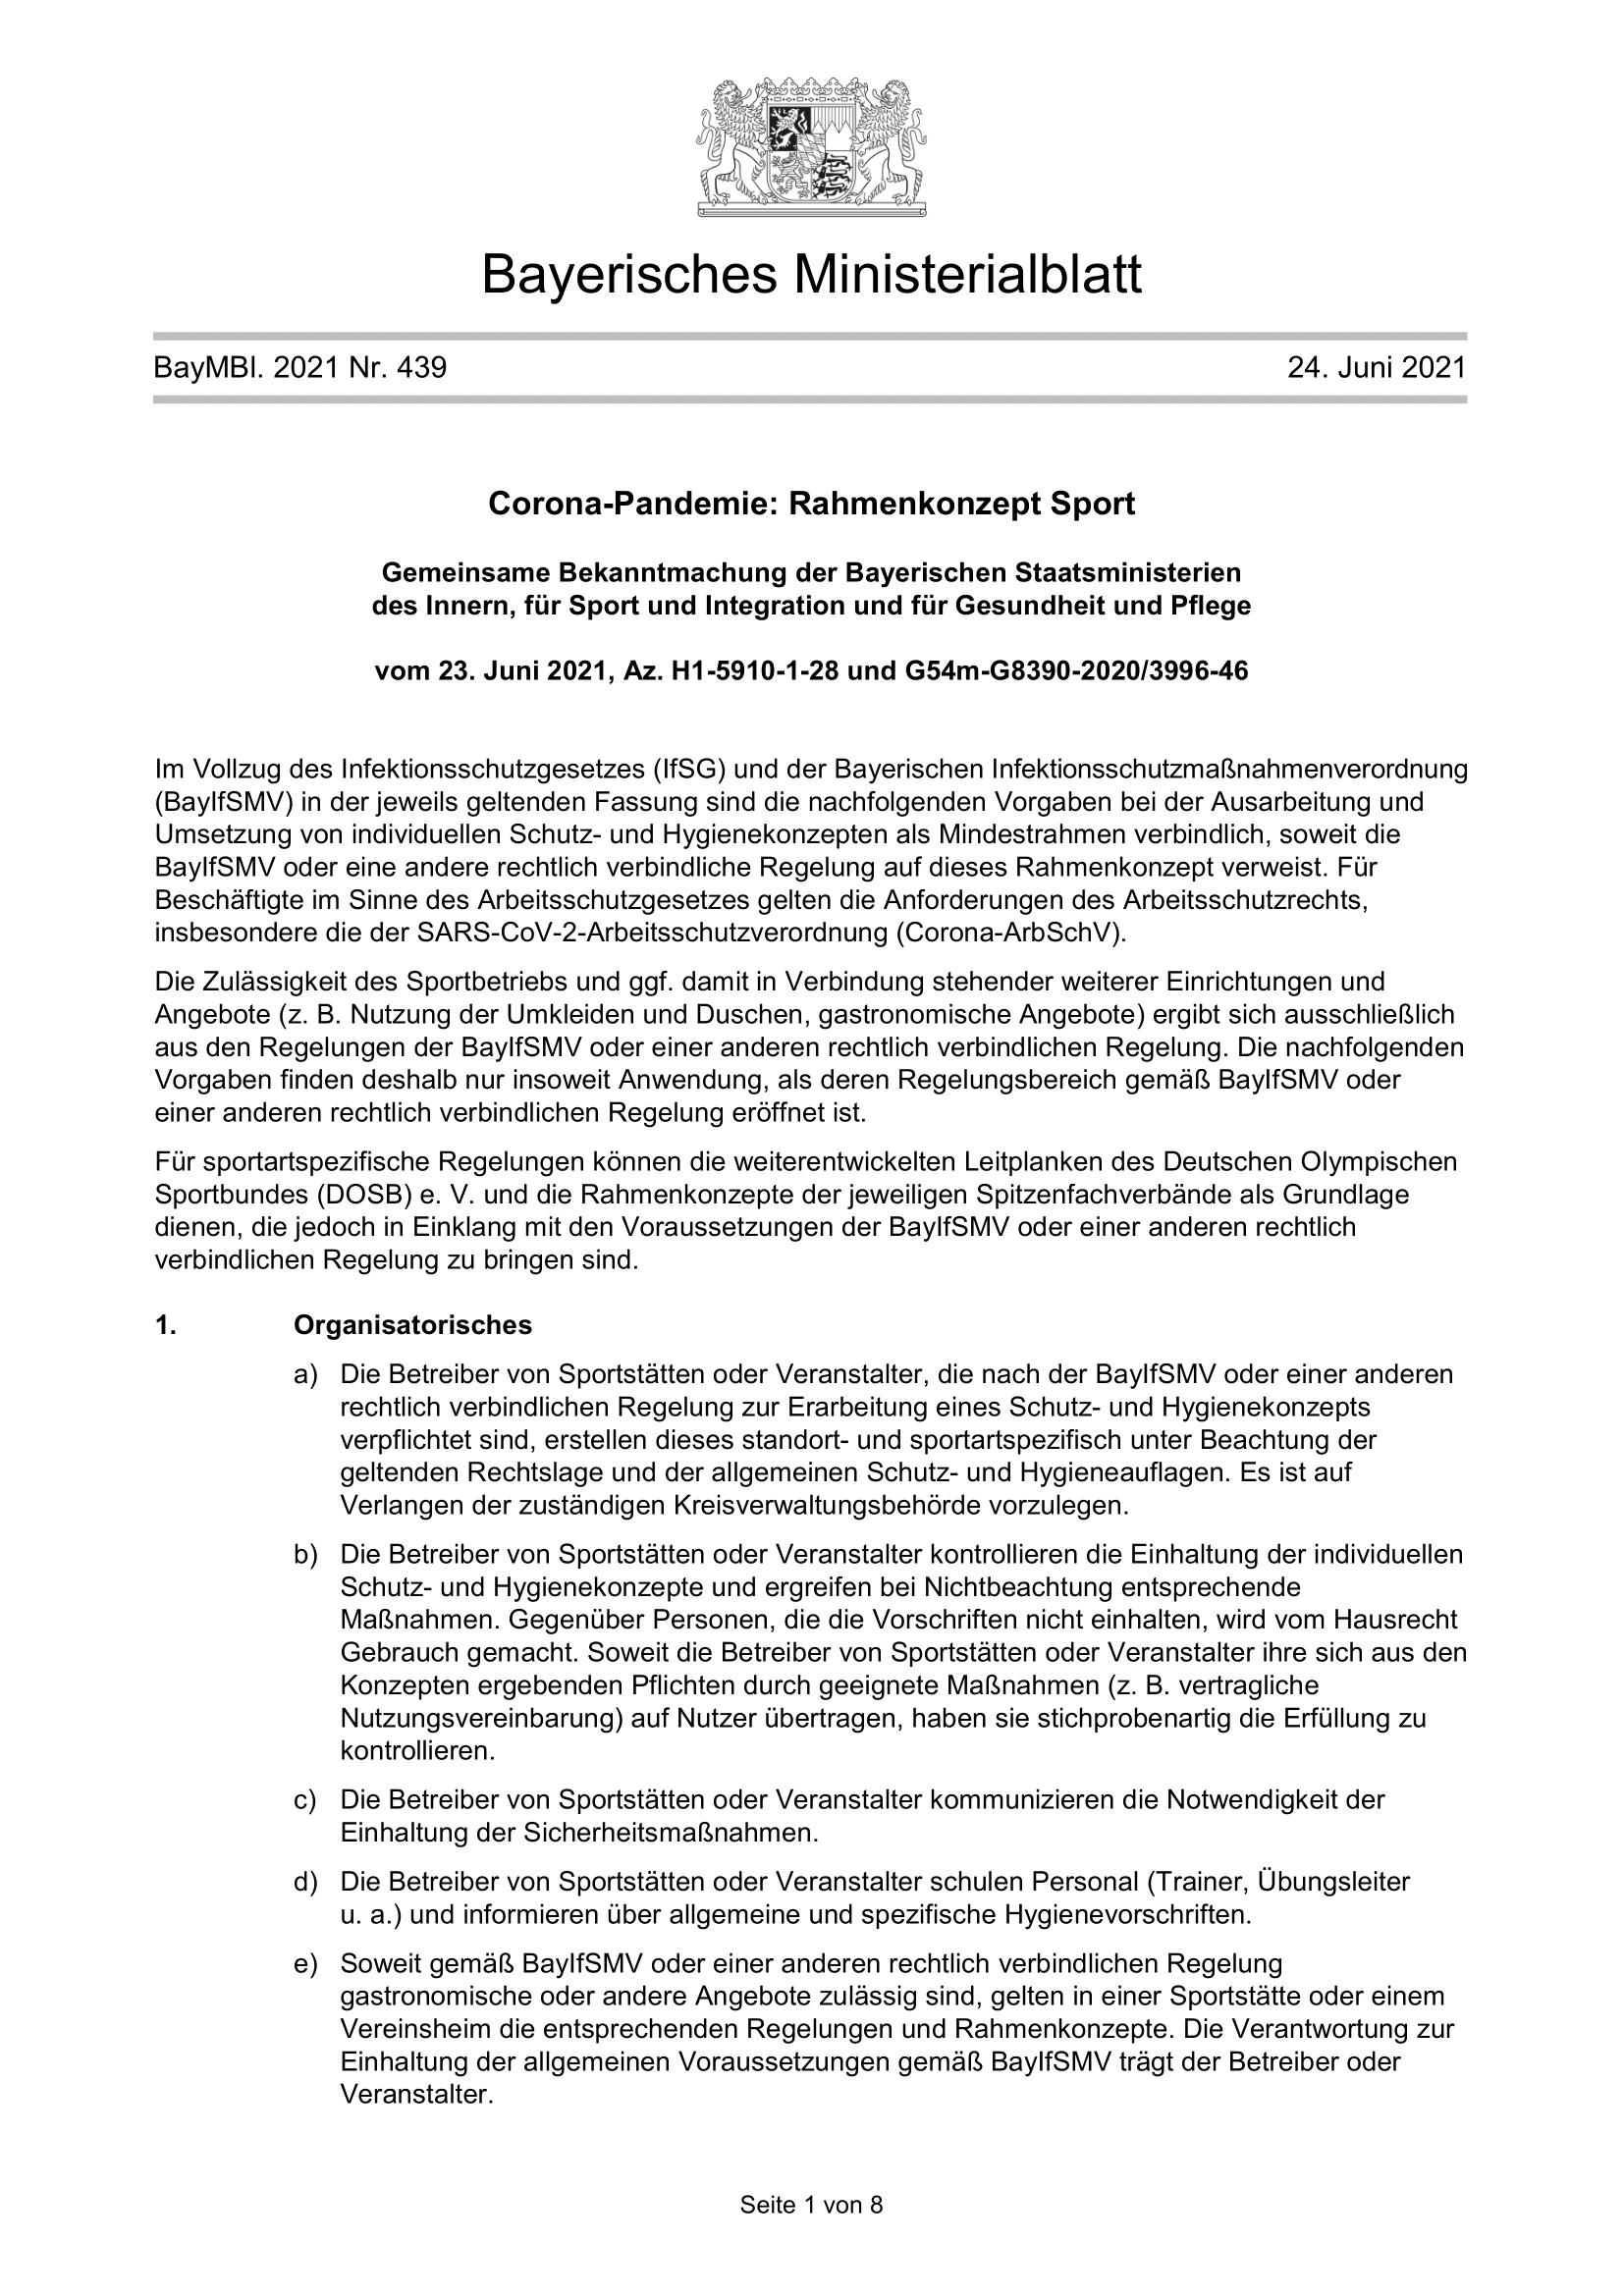 Rahmenkonzept Sport 23.6-1